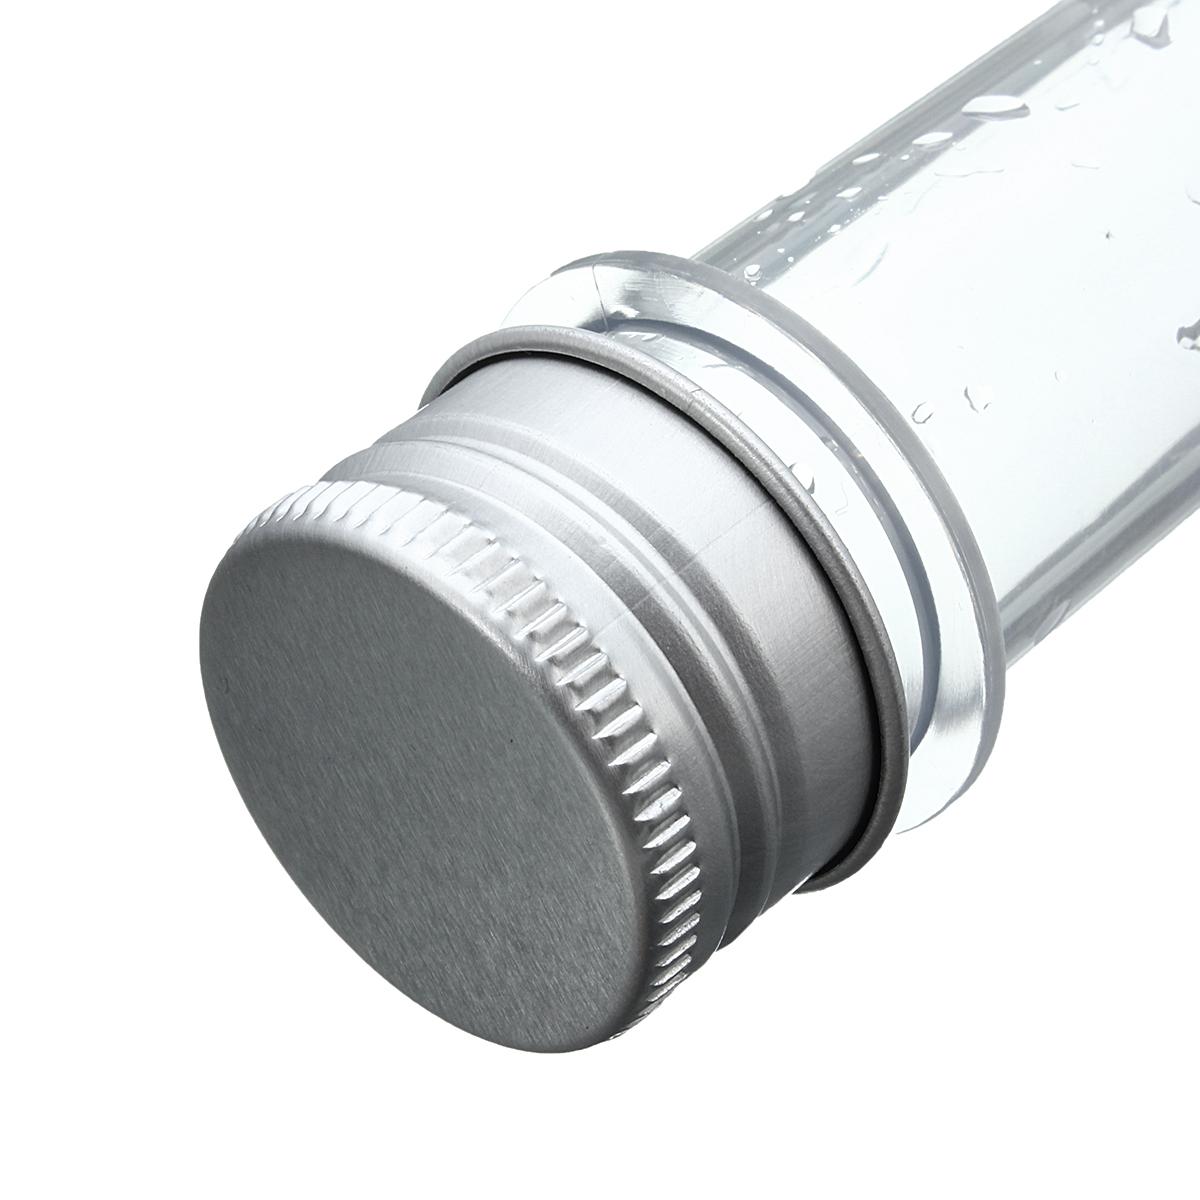 Ml plastic lab round bottom test tube with metal screw